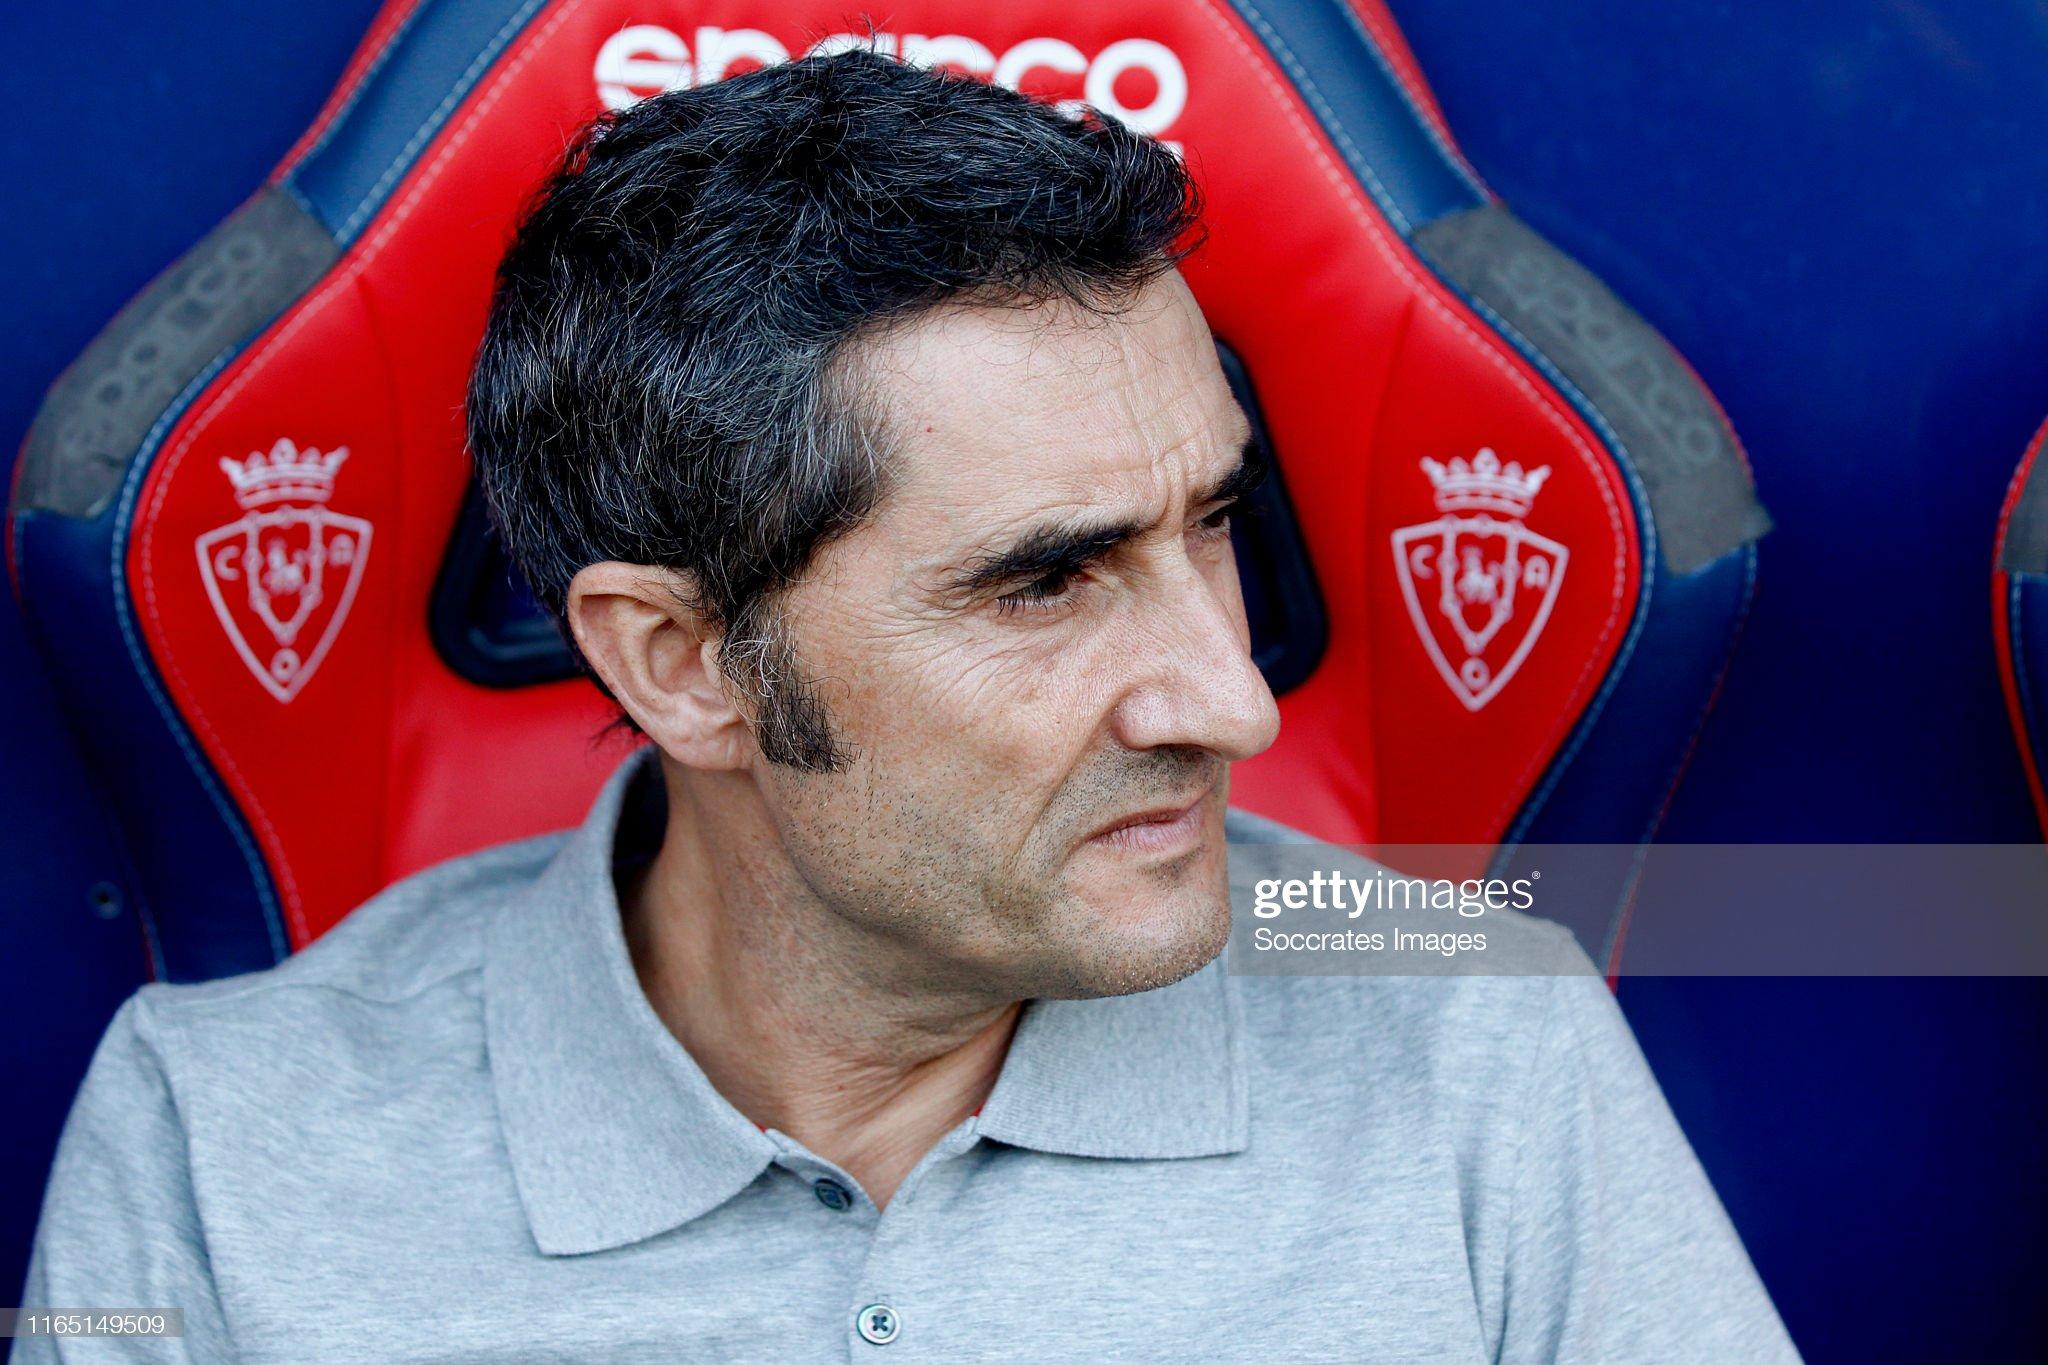 صور مباراة : أوساسونا - برشلونة 2-2 ( 31-08-2019 )  Coach-ernesto-valverde-of-fc-barcelona-during-the-la-liga-santander-picture-id1165149509?s=2048x2048